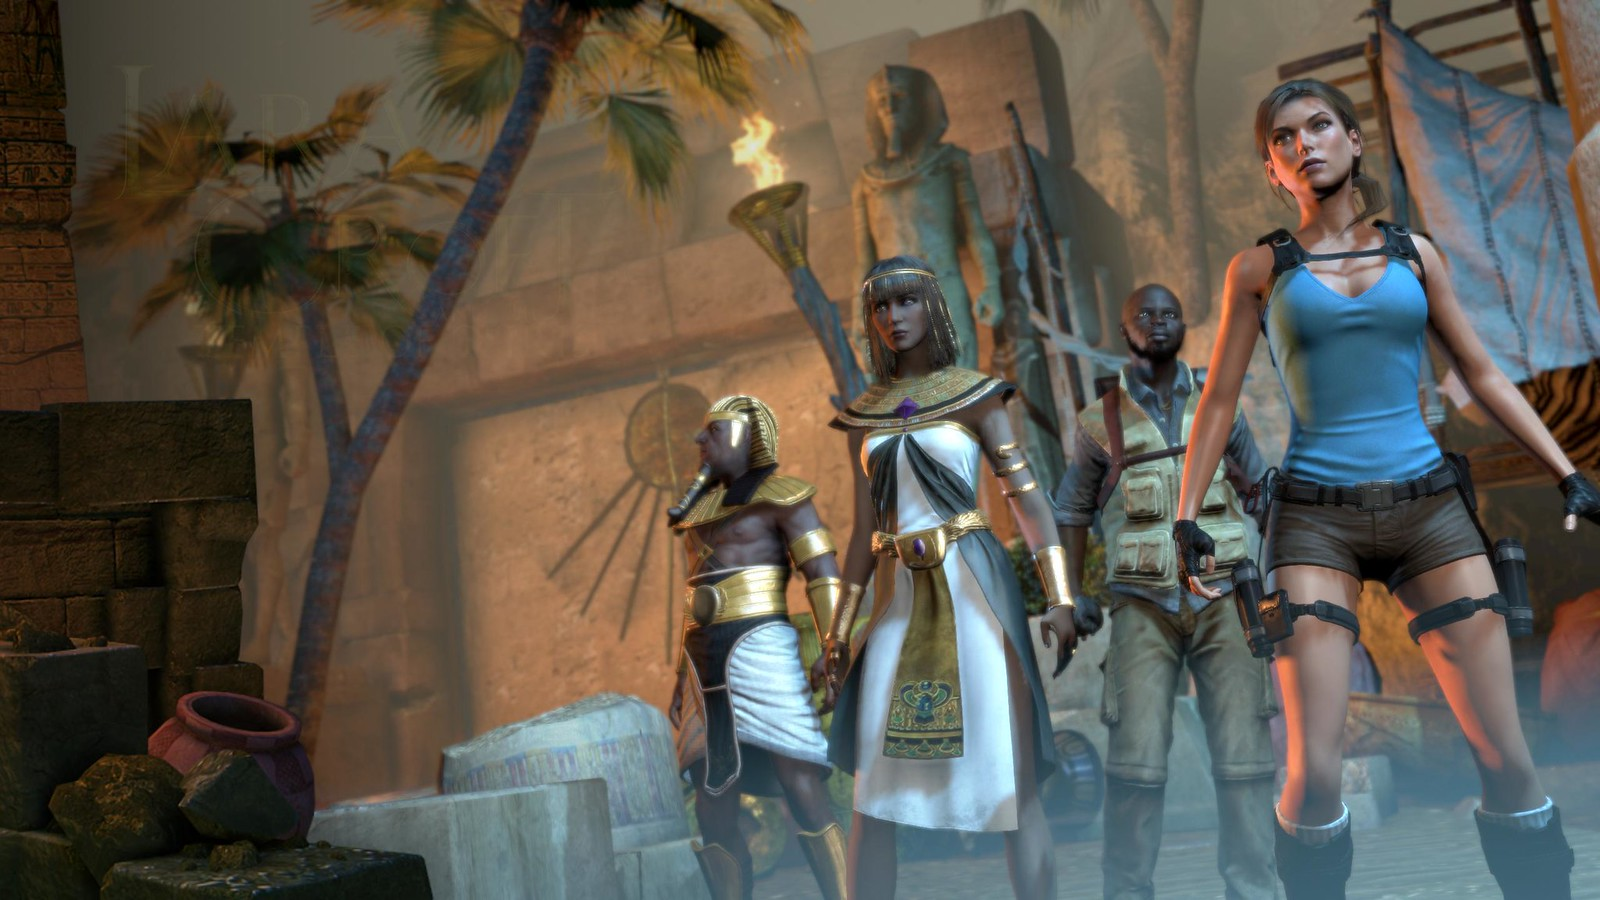 Fw: [心得]古墓奇兵:歐西里斯神殿---不如前作